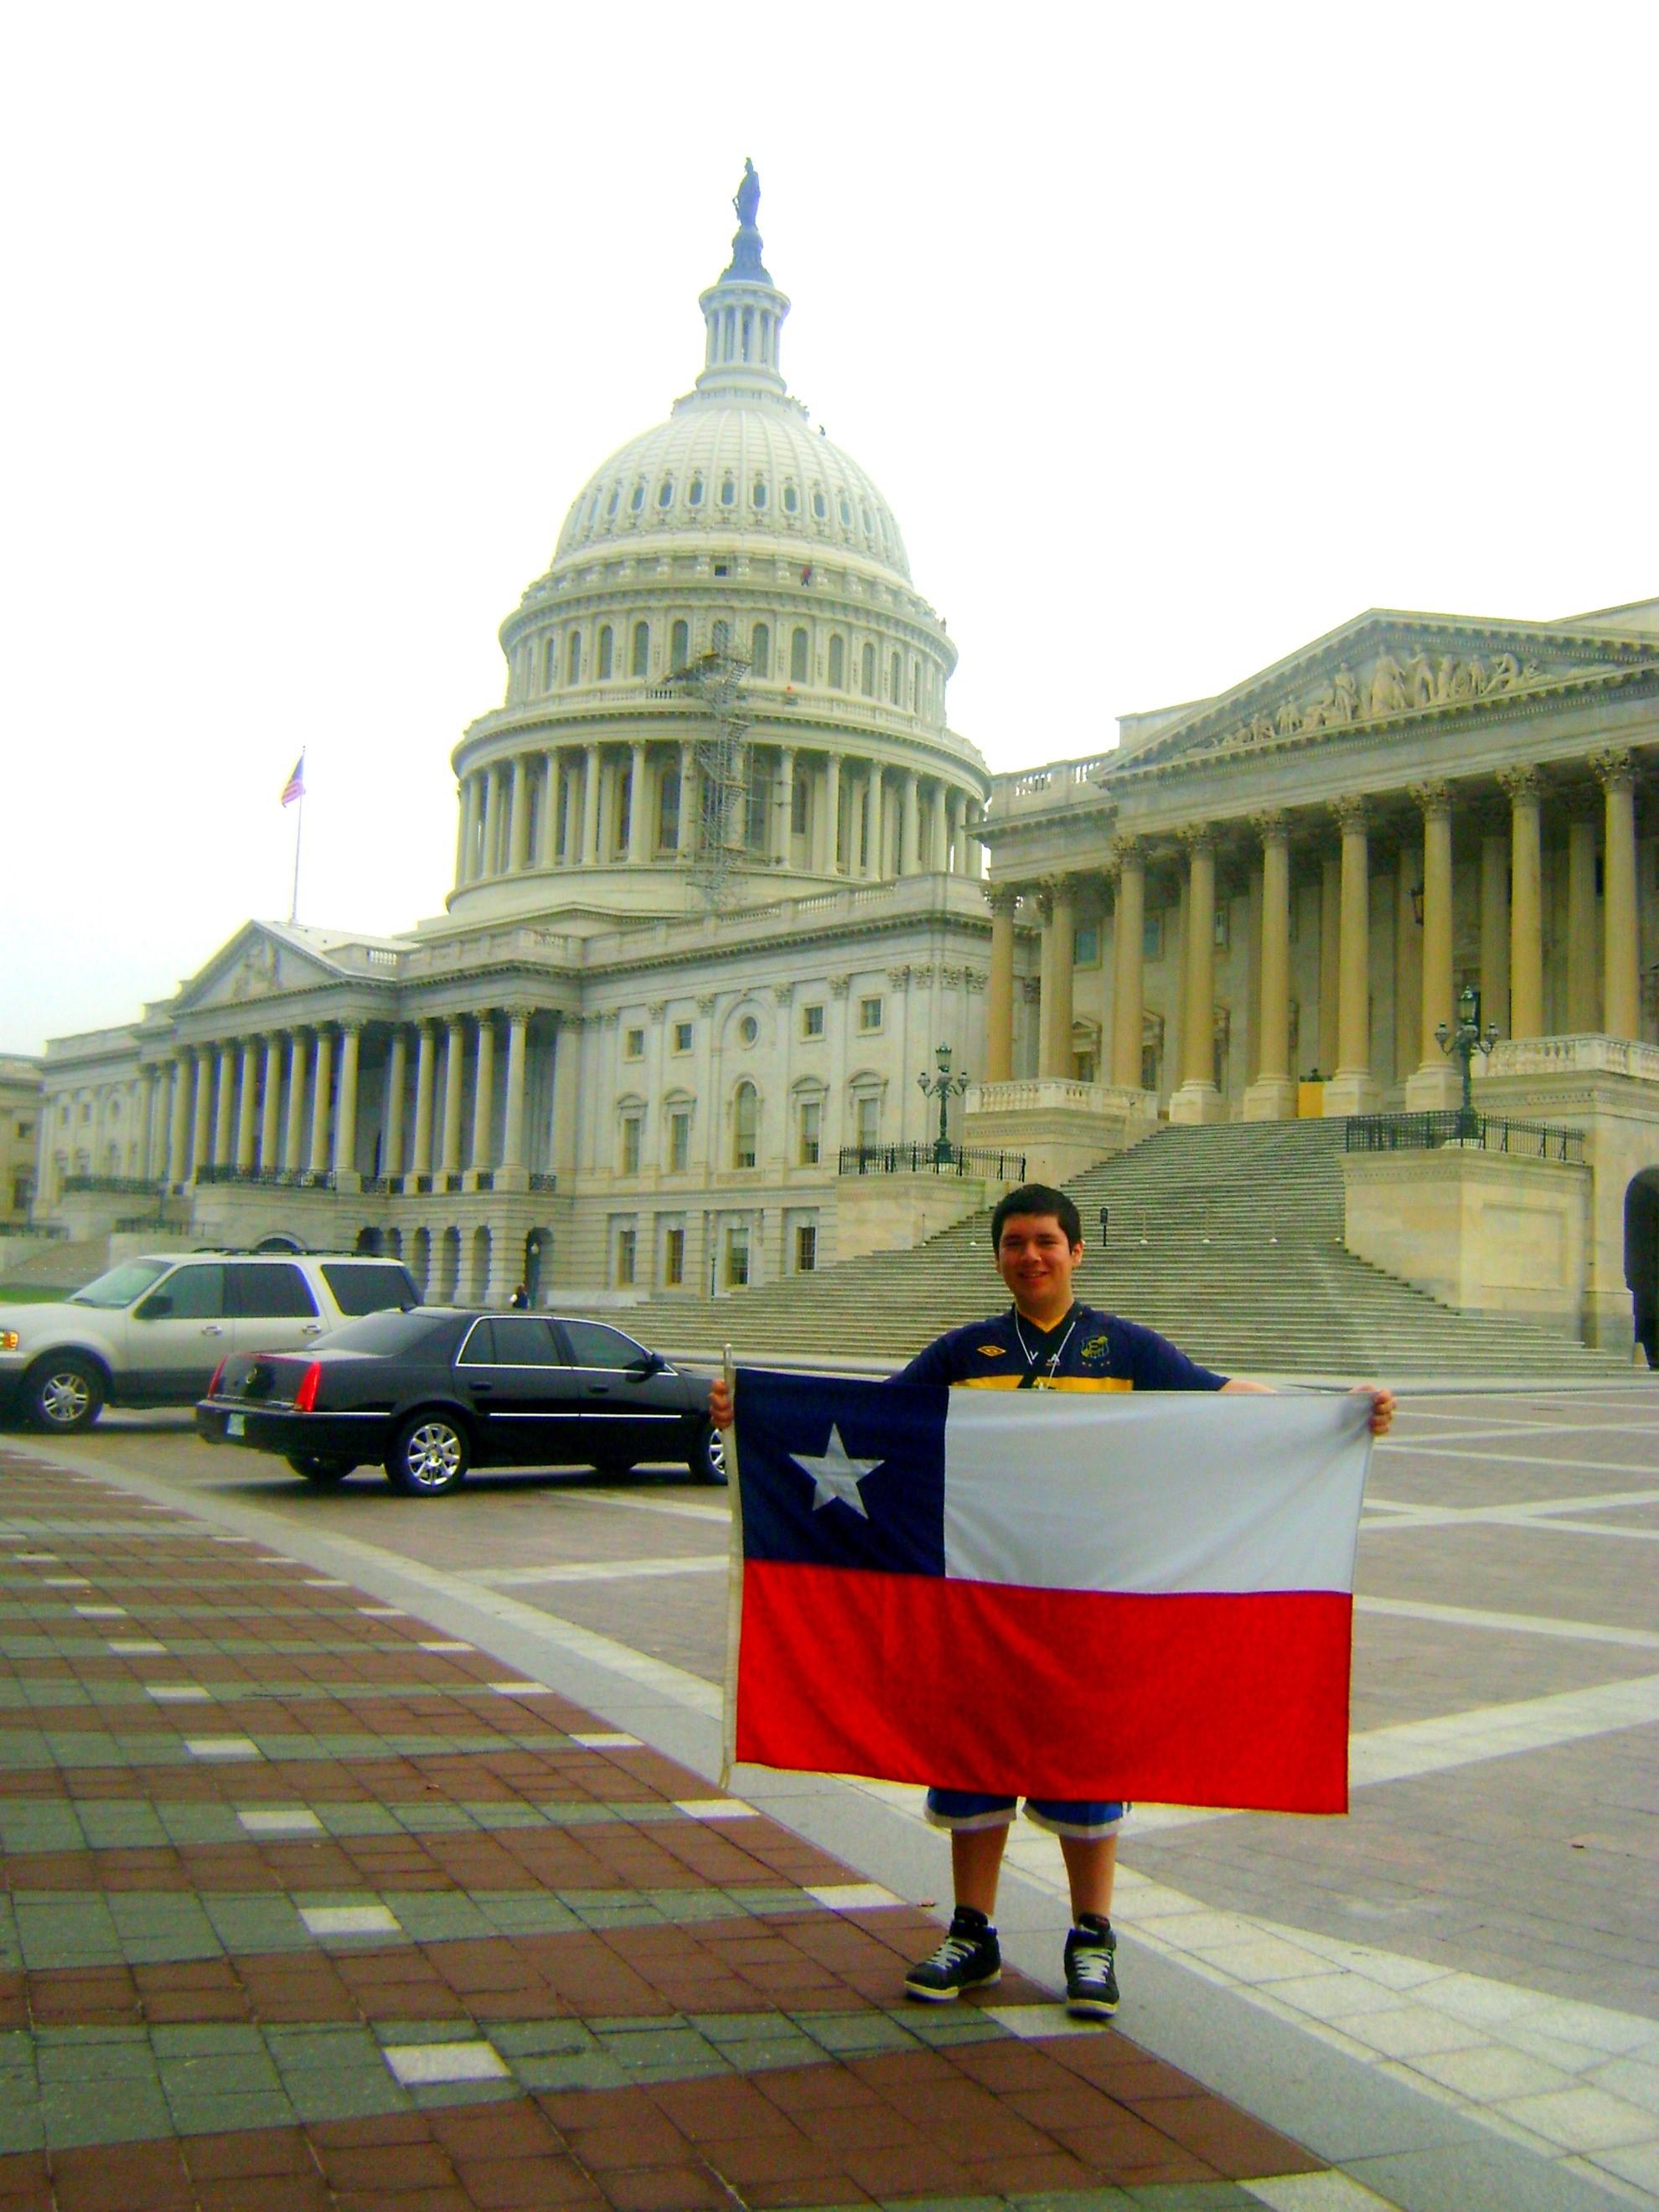 Teléfono Embajada de Estados Unidos en América Latina ...